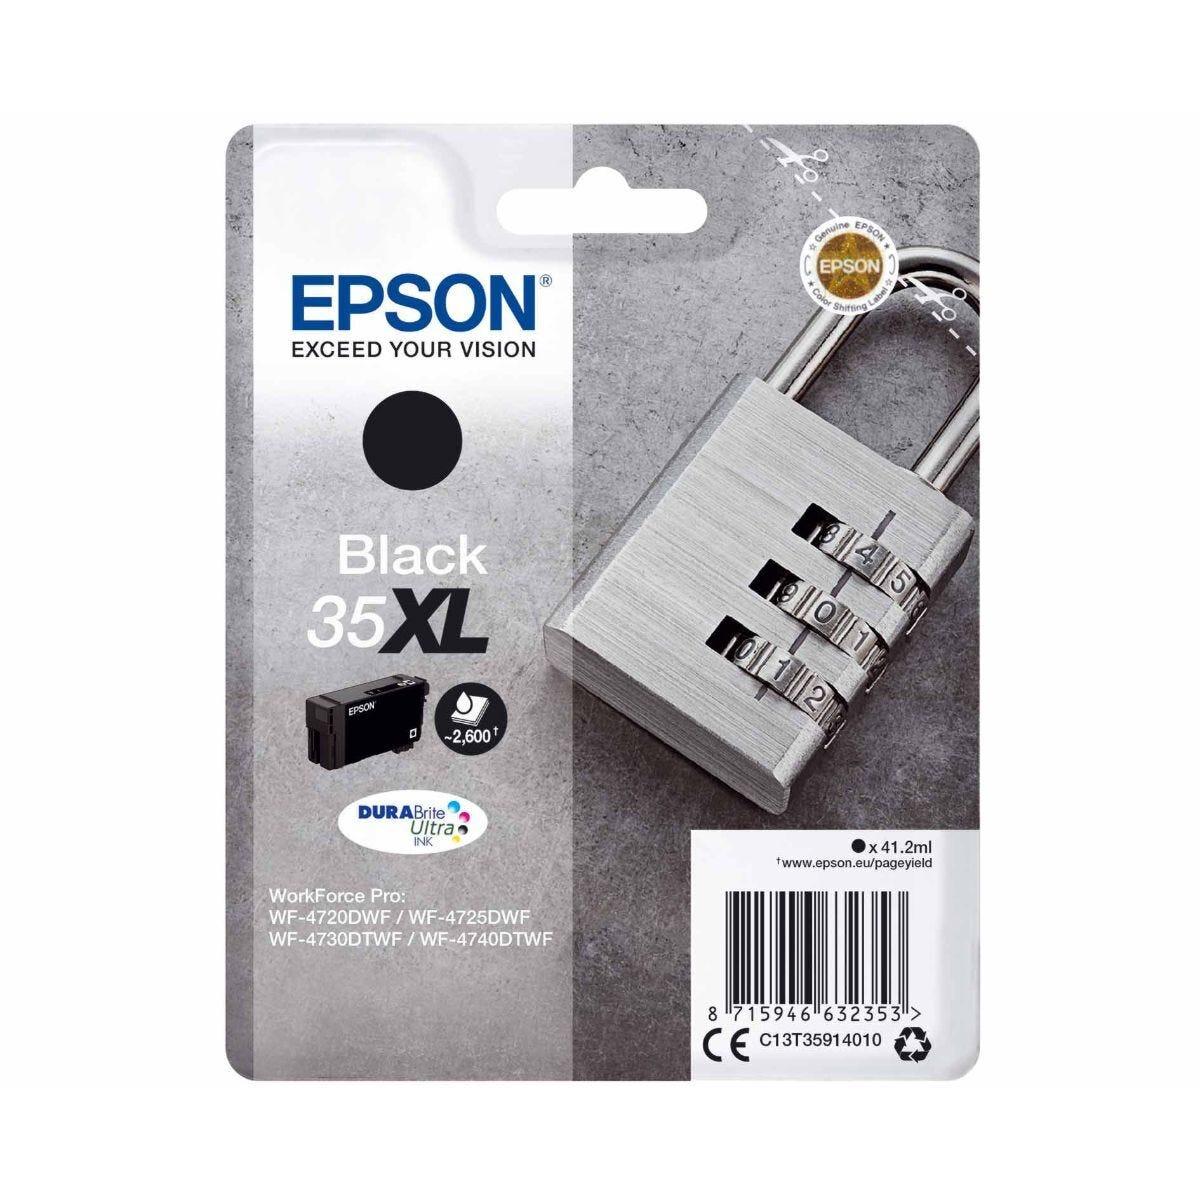 Epson 35XL Multipack WorkFroce Pro Black Ink